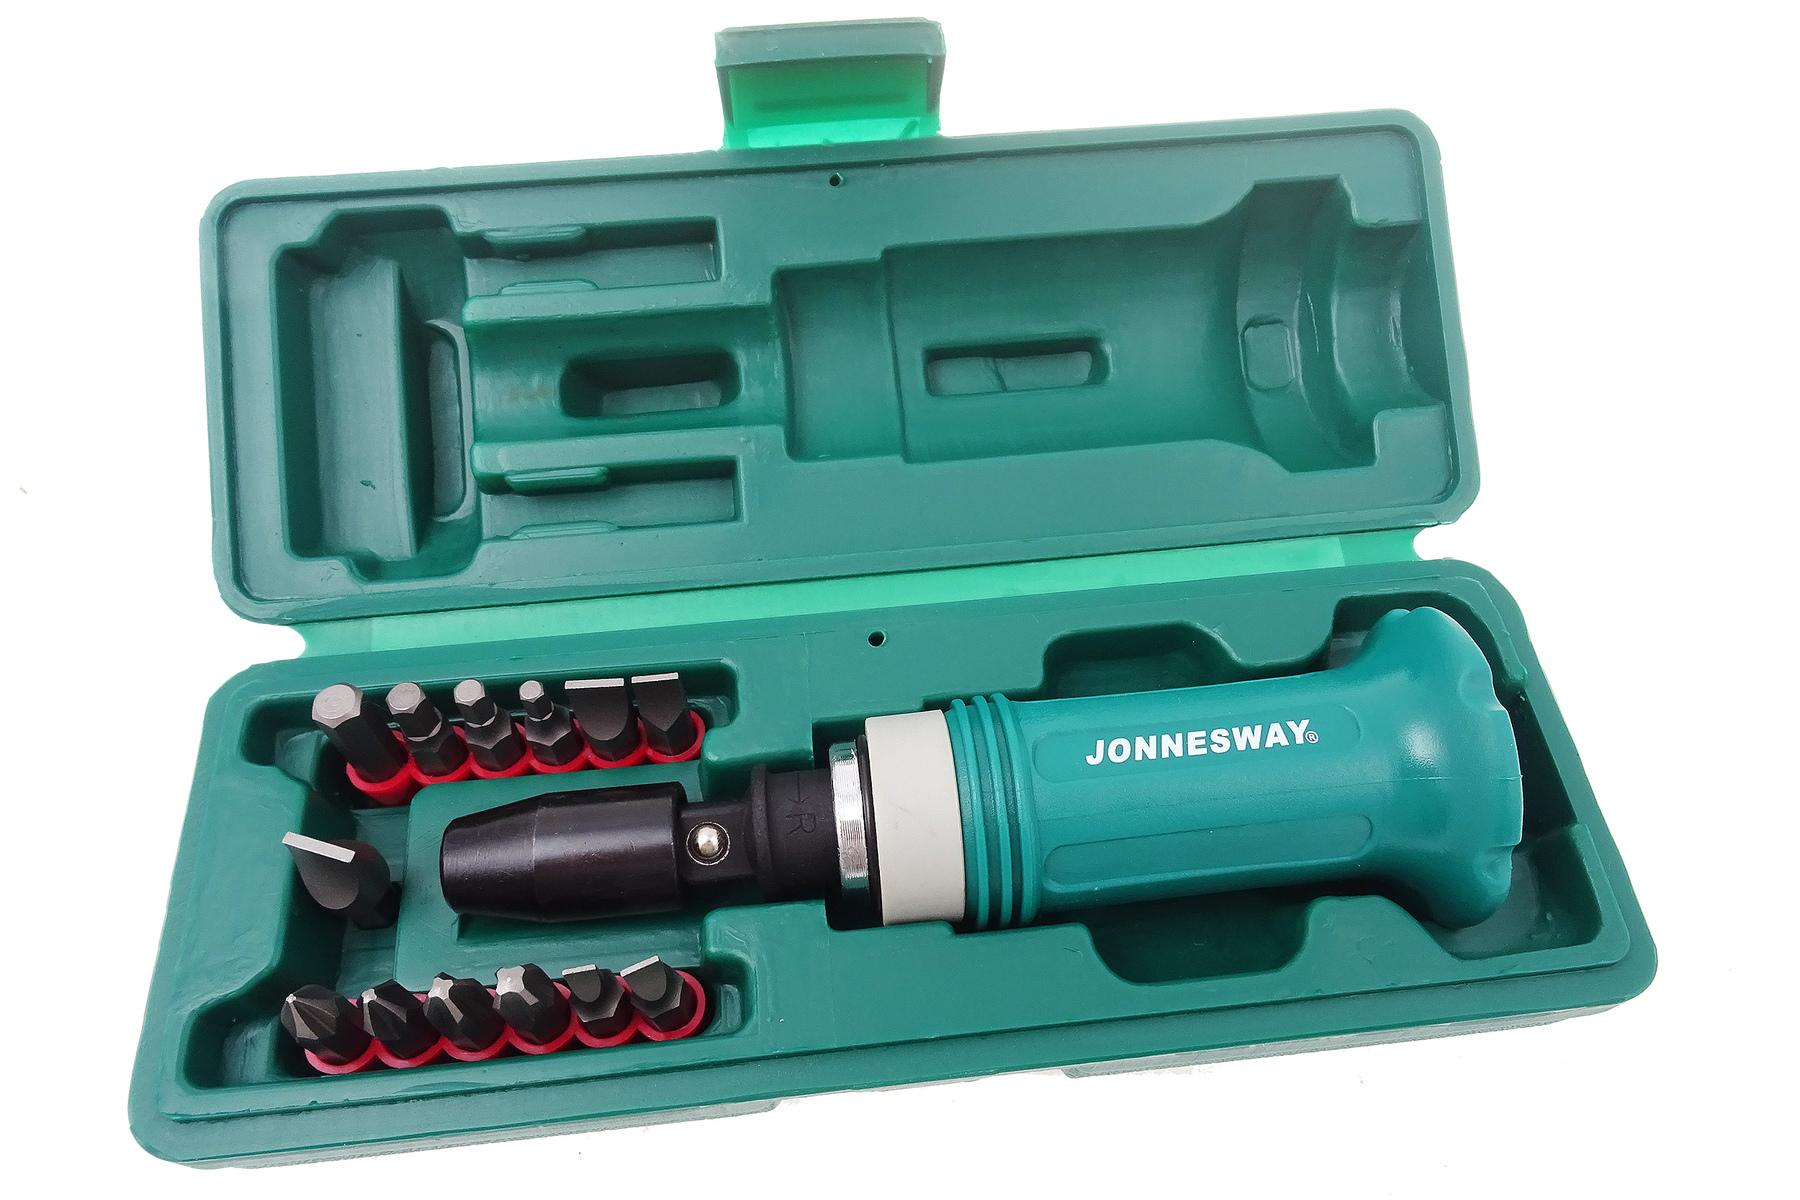 "Úderový / rázový šroubovák s adaptérem 1/2"" - JONNESWAY AG010138"